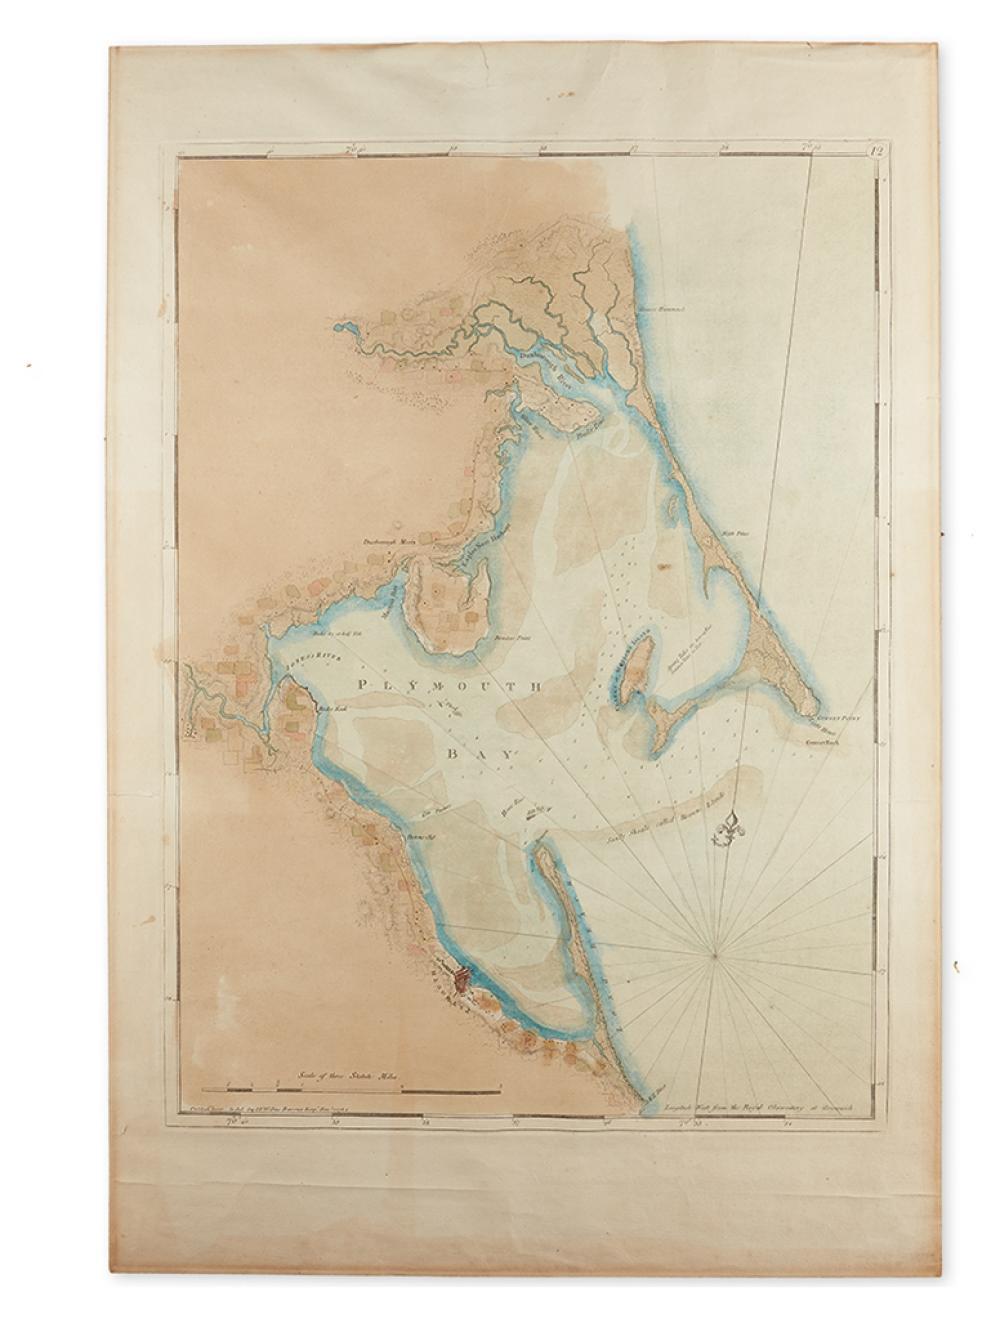 DES BARRES, JOSEPH FREDERICK WALLET. [Plymouth Bay.]